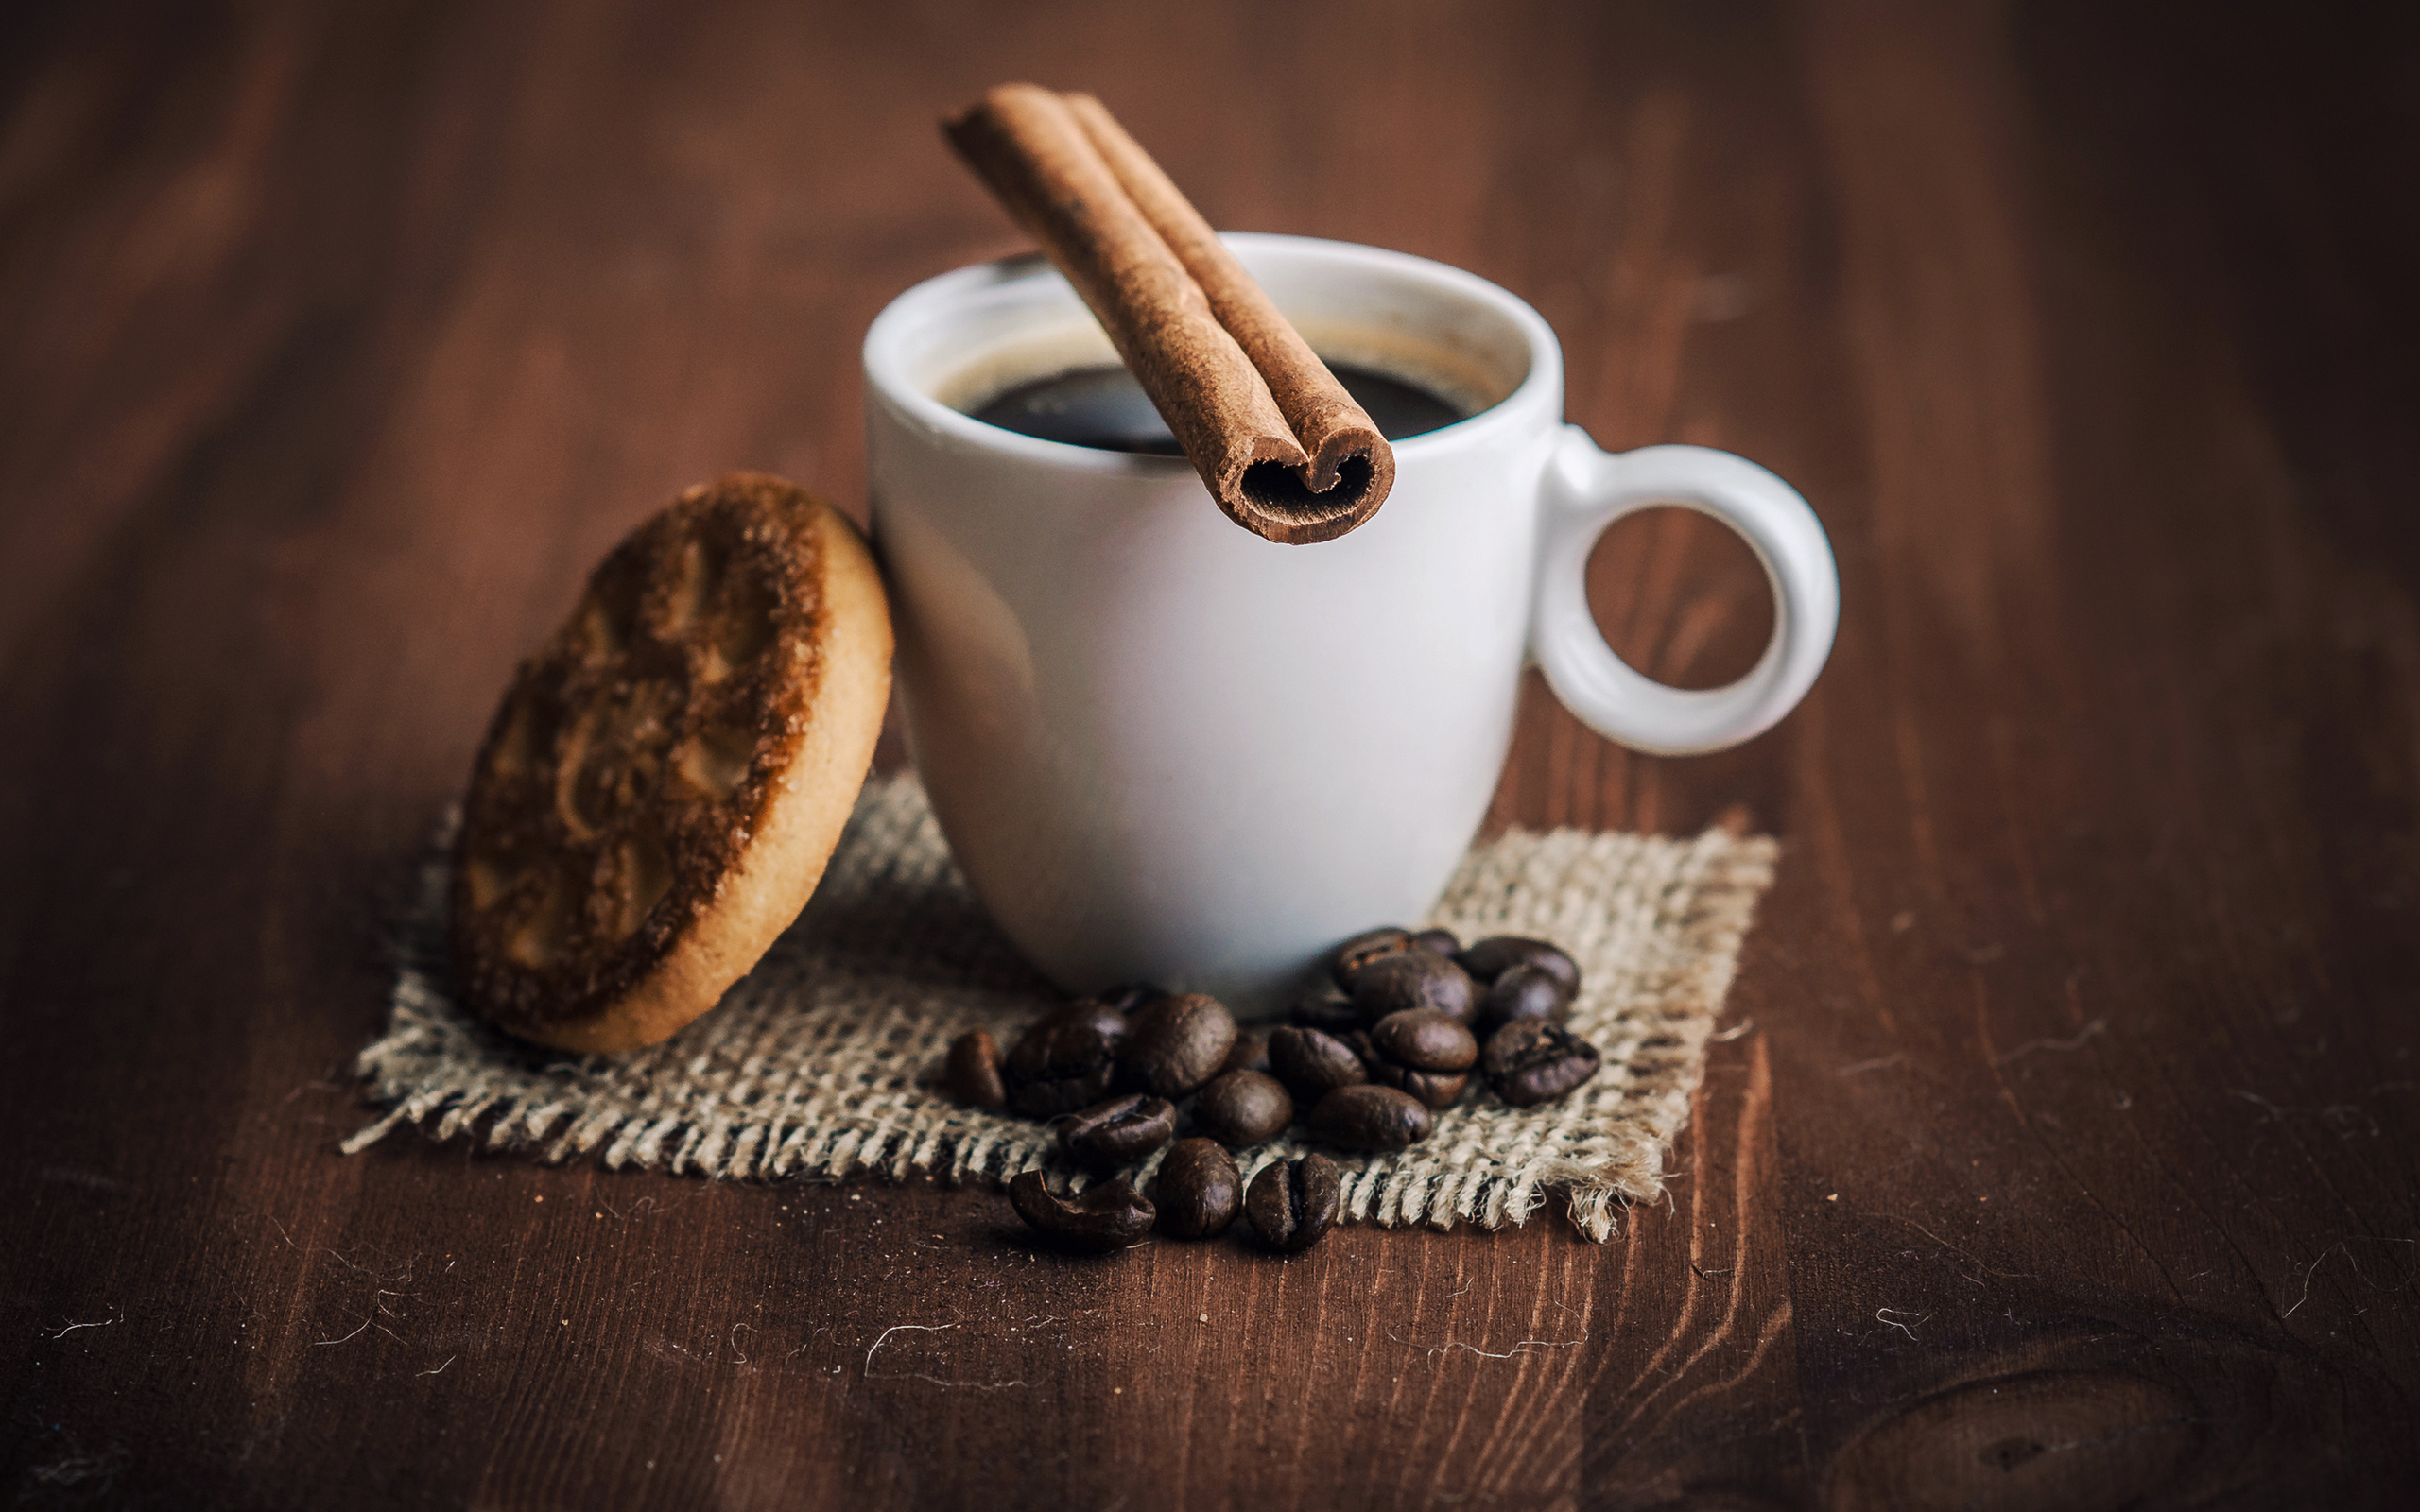 еда кофе печенье бесплатно